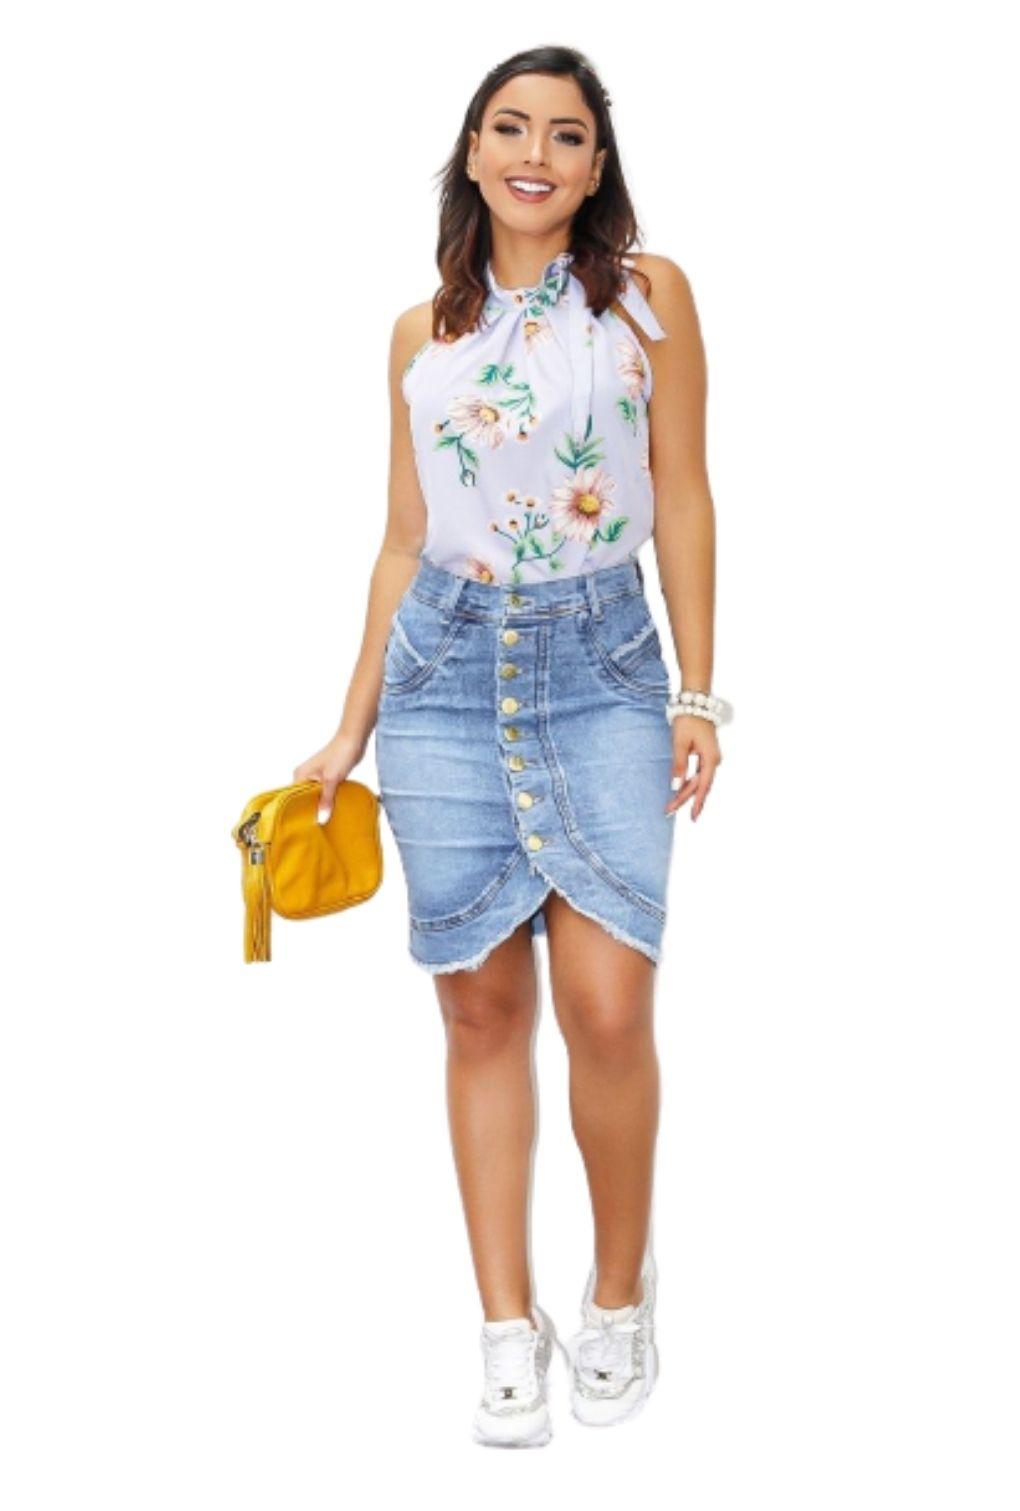 Saia Jeans Feminina Botões Frontal Abertura  - ModaStore | Moda Feminina